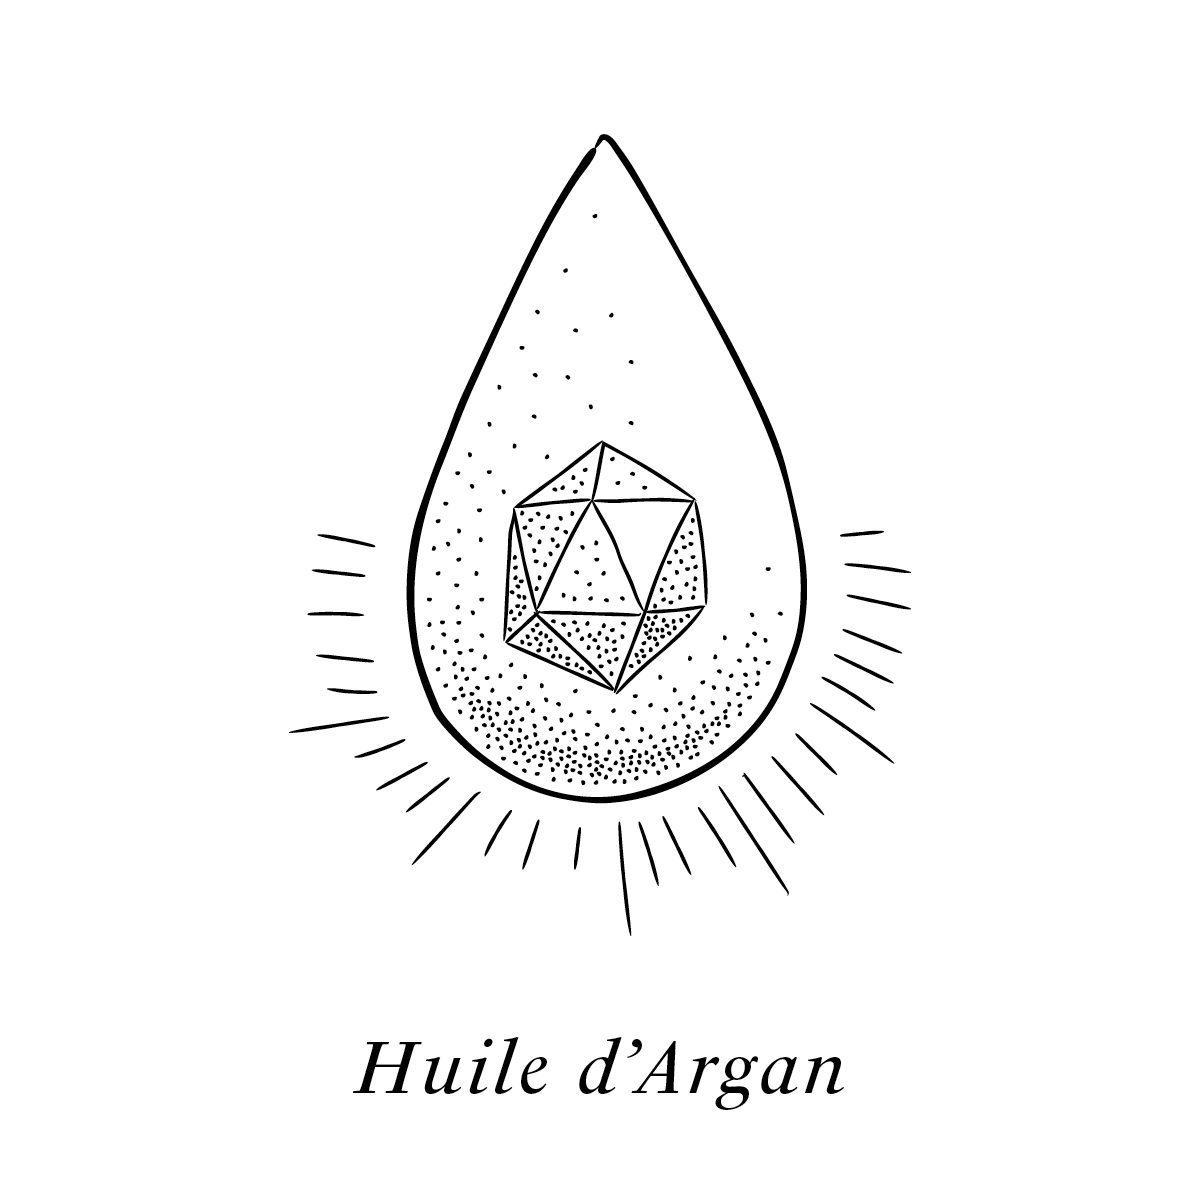 Illustration de l'huile d'Argan, un des 19 actifs de la crème Claudius N°1, design ichetkar